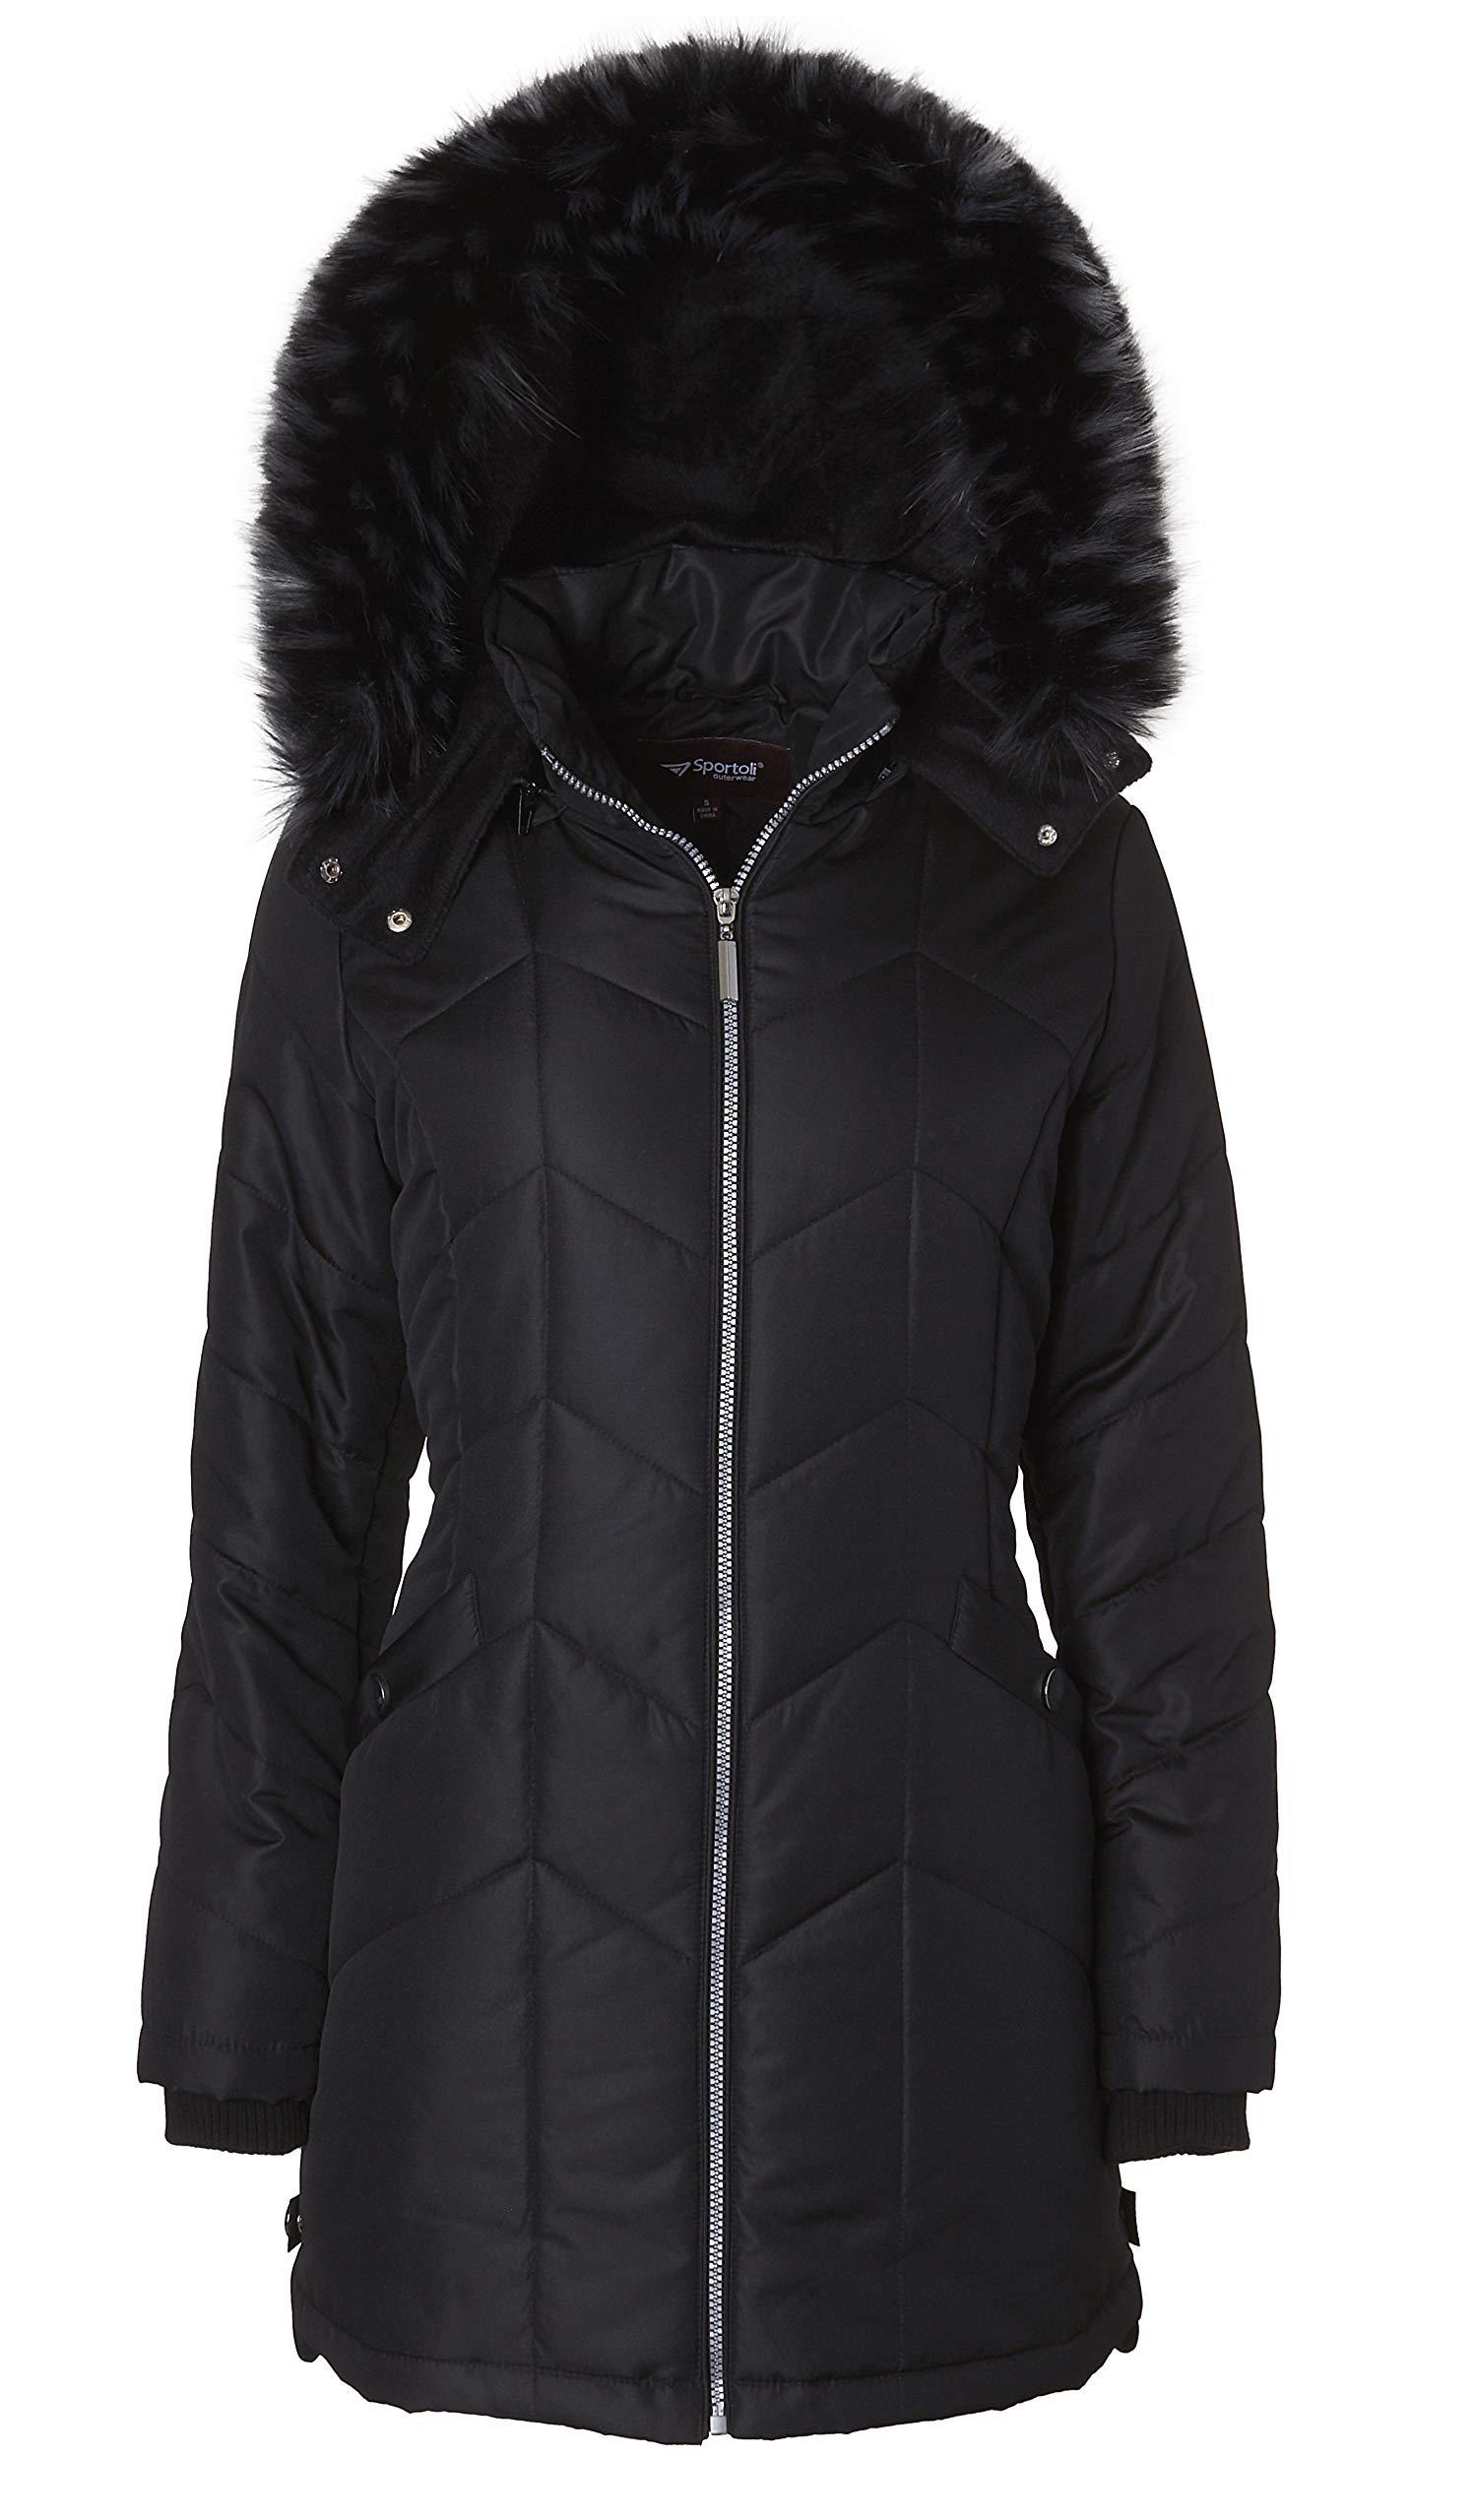 7bbcb17dfa0 Women s Long Down Alternative Puffer Coat Detachable Plush Lined Fur Trim  Hood product image